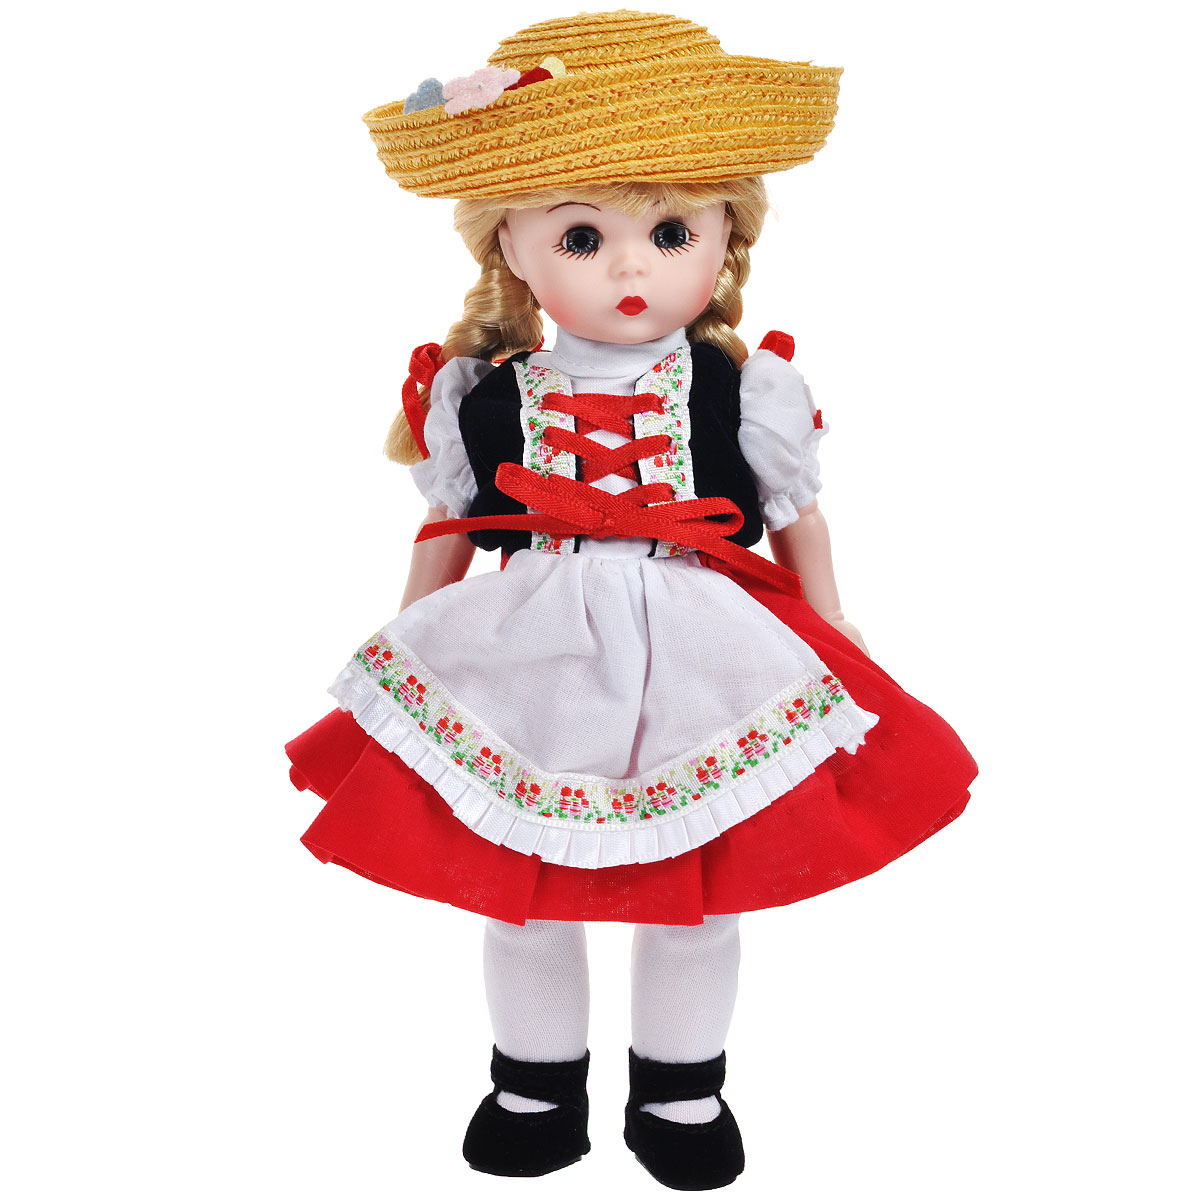 Madame Alexander Кукла Хейди куклы и одежда для кукол madame alexander кукла фэнси нэнси русалочка 20 см